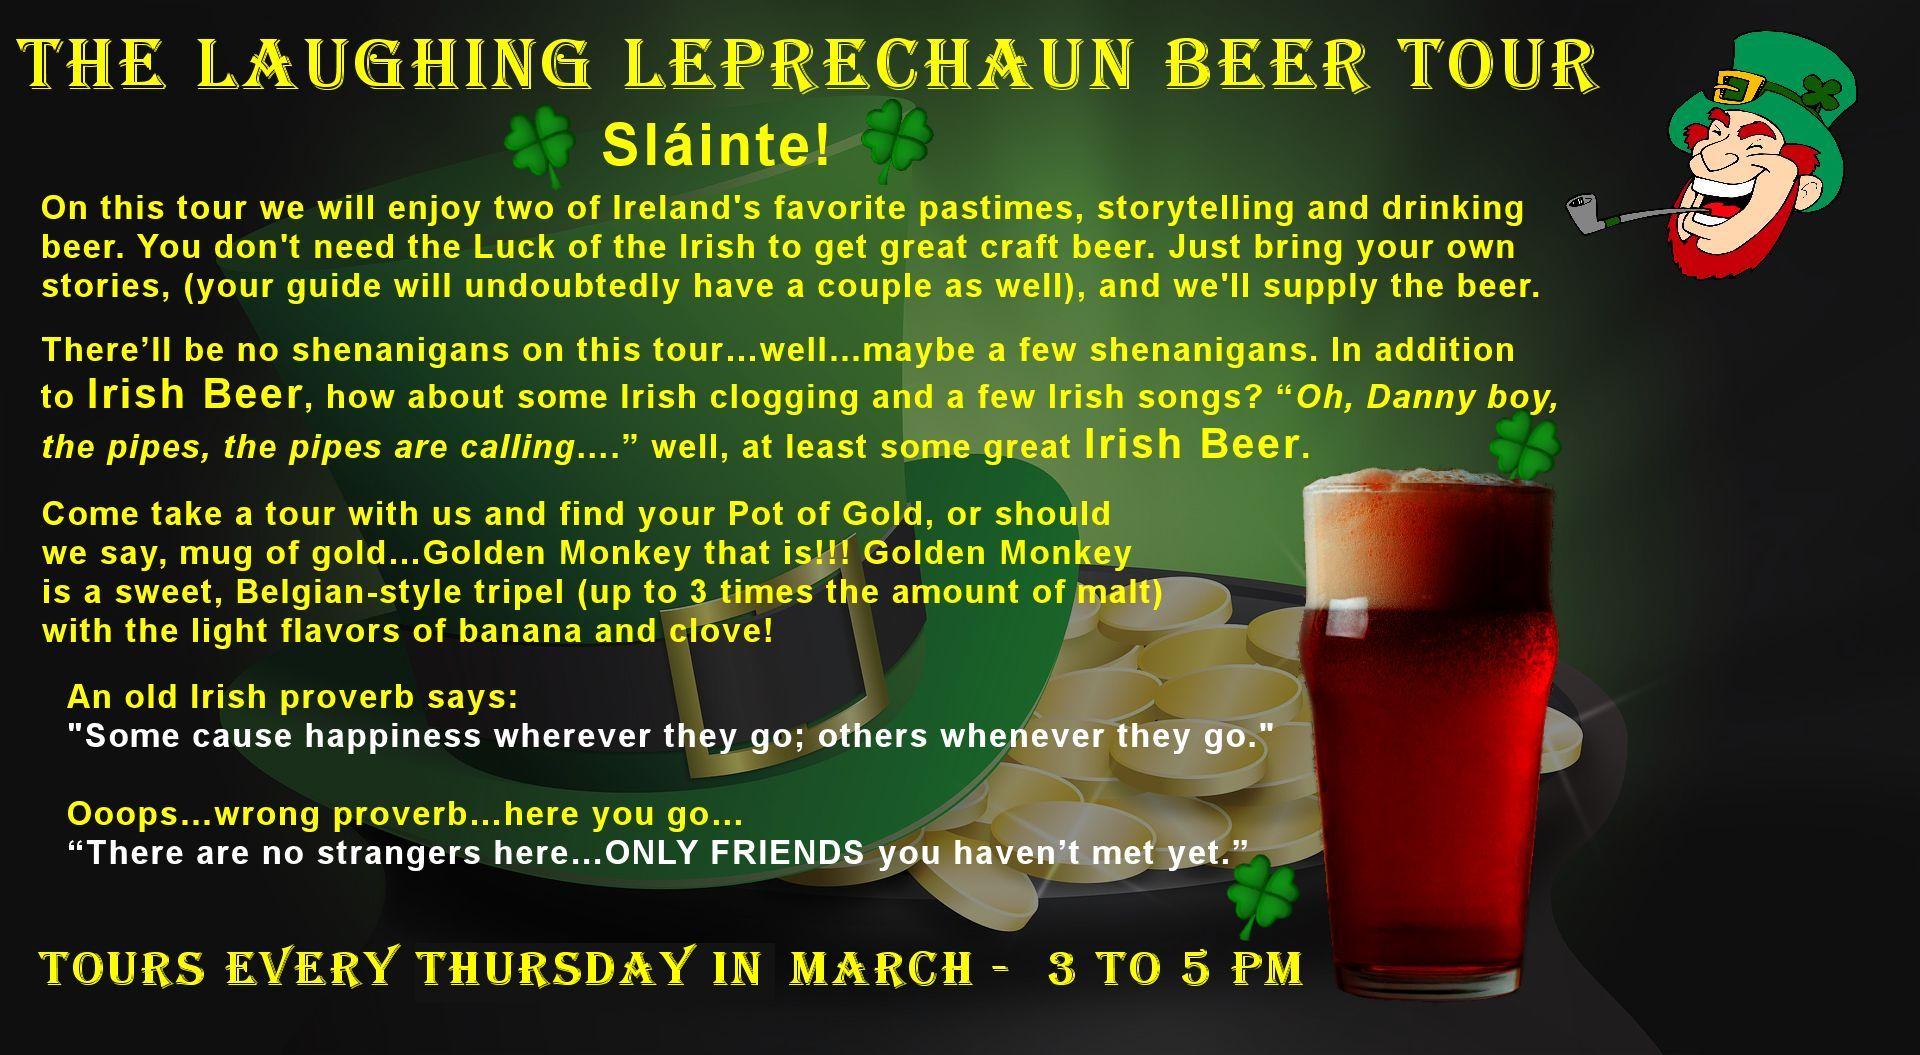 The Laughing Leprechaun Beer Tour